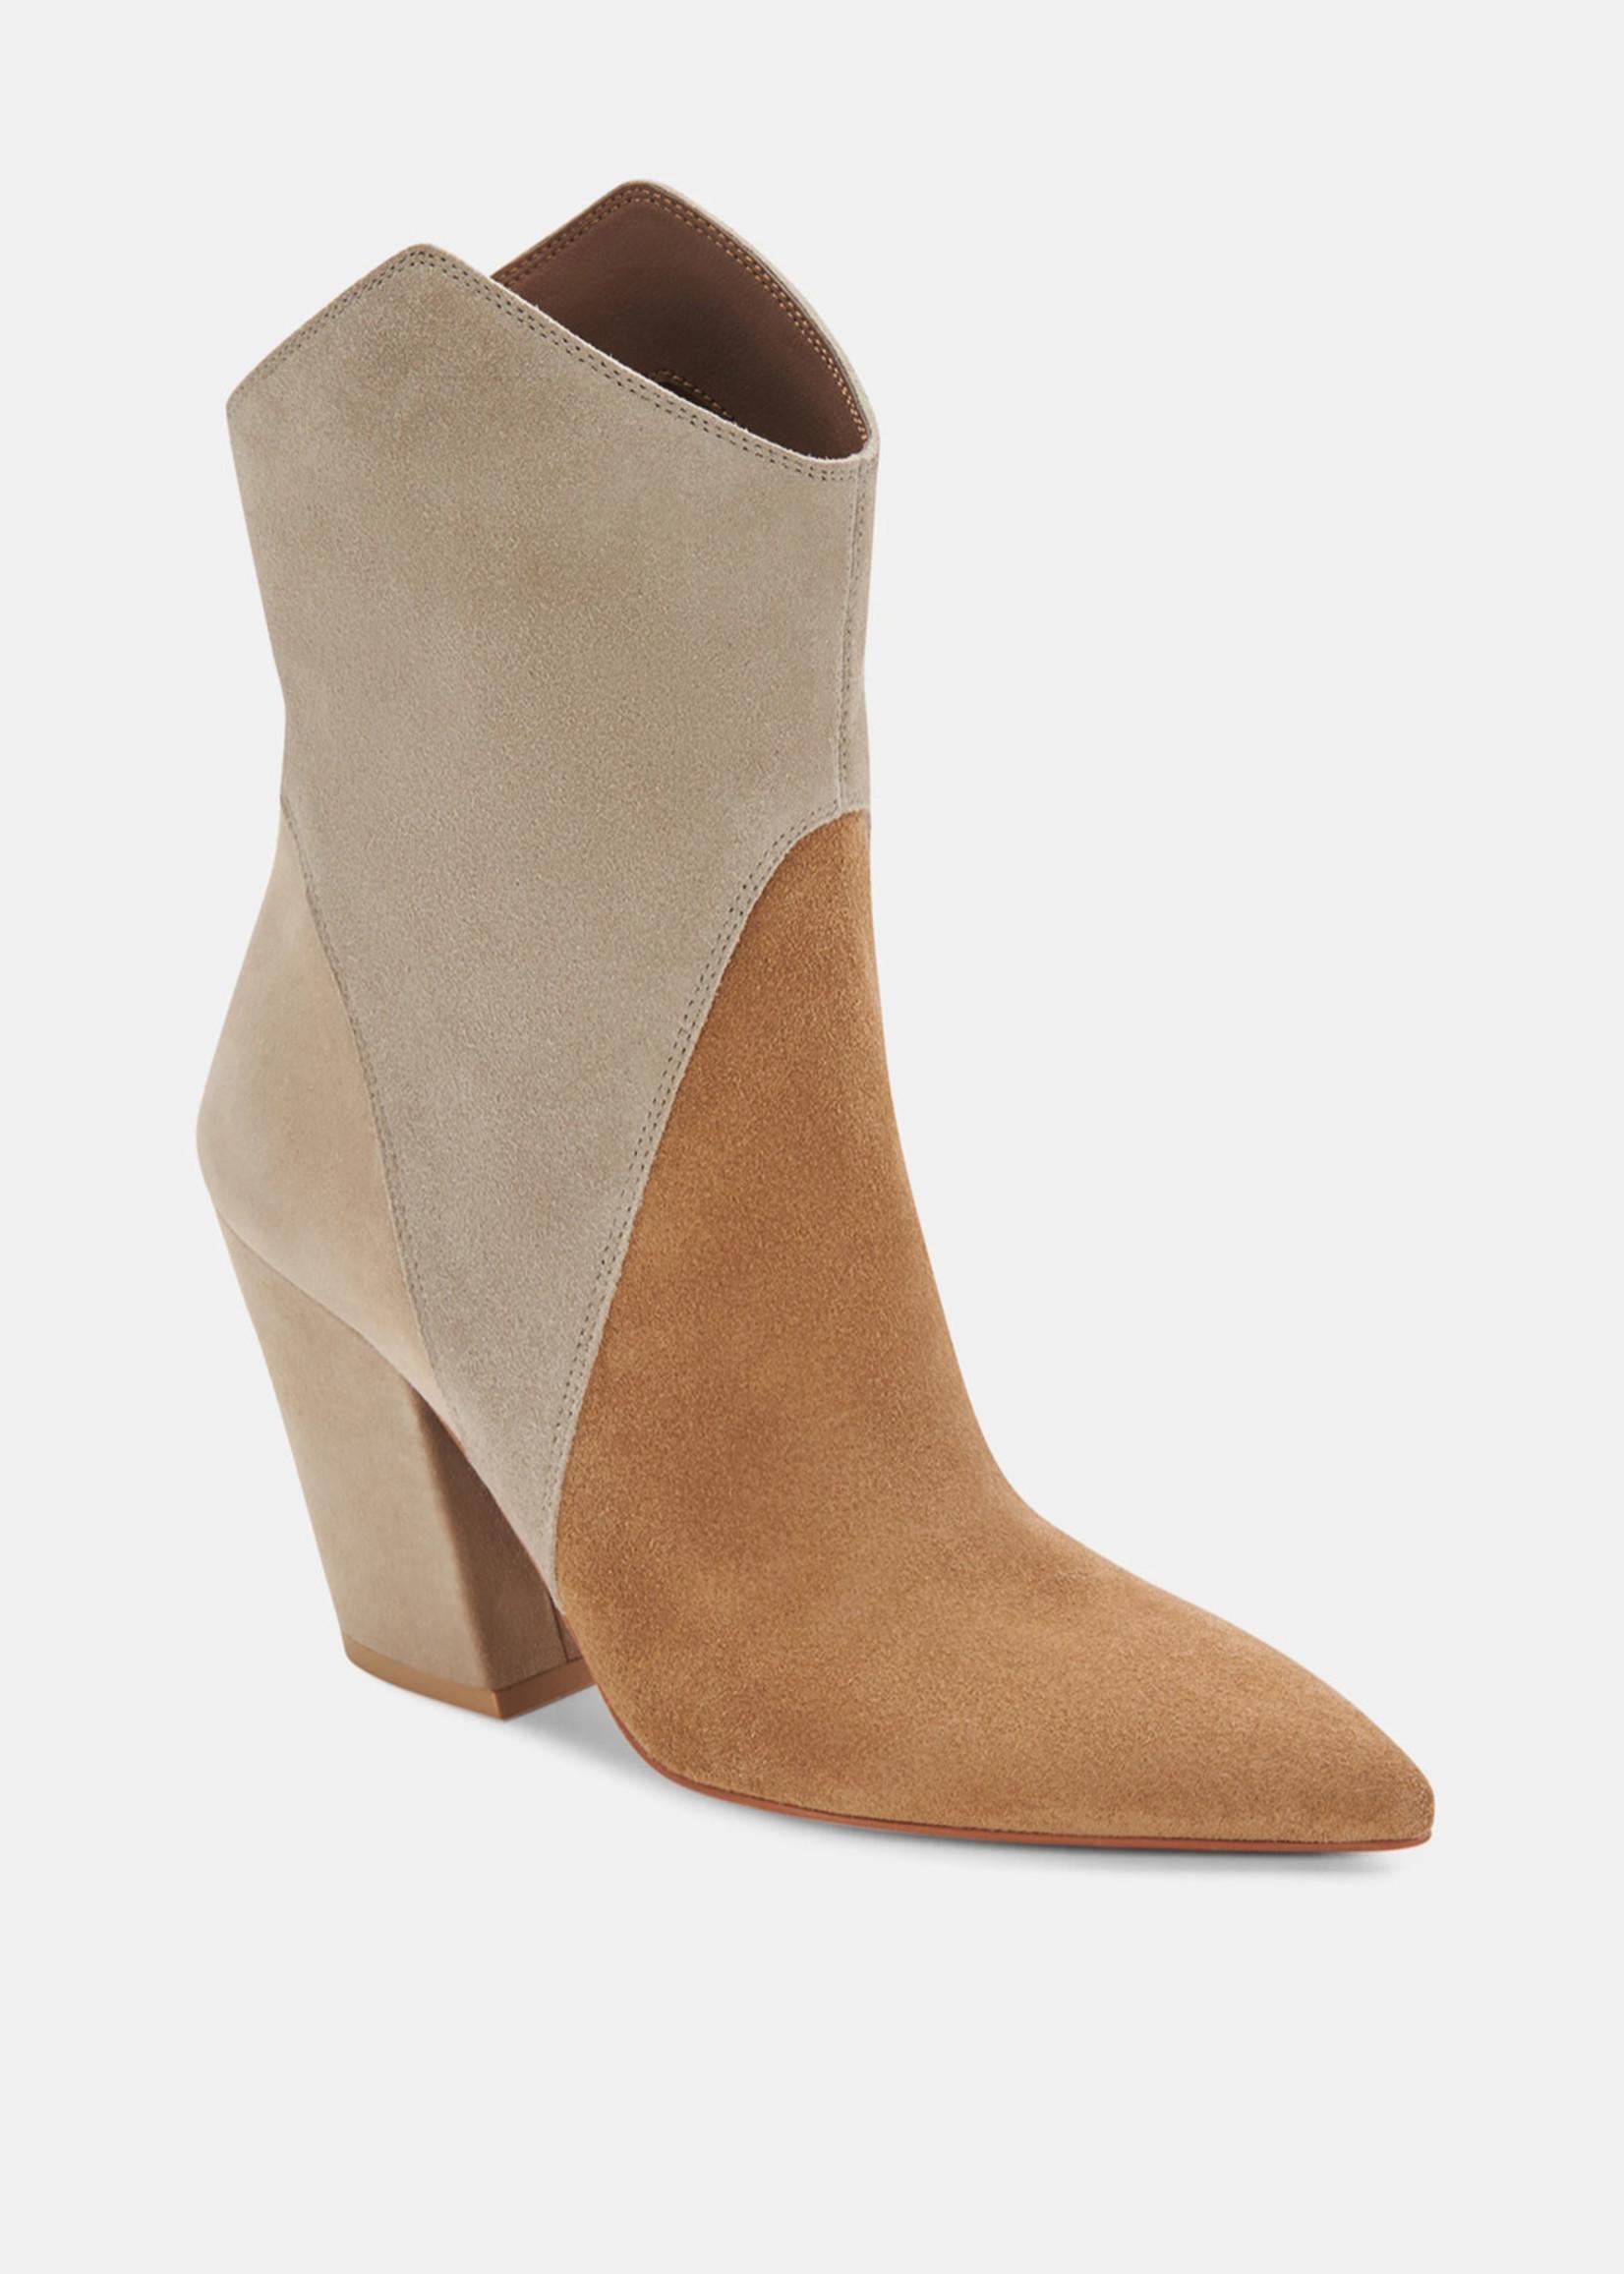 Dolce Vita Nestly Boot